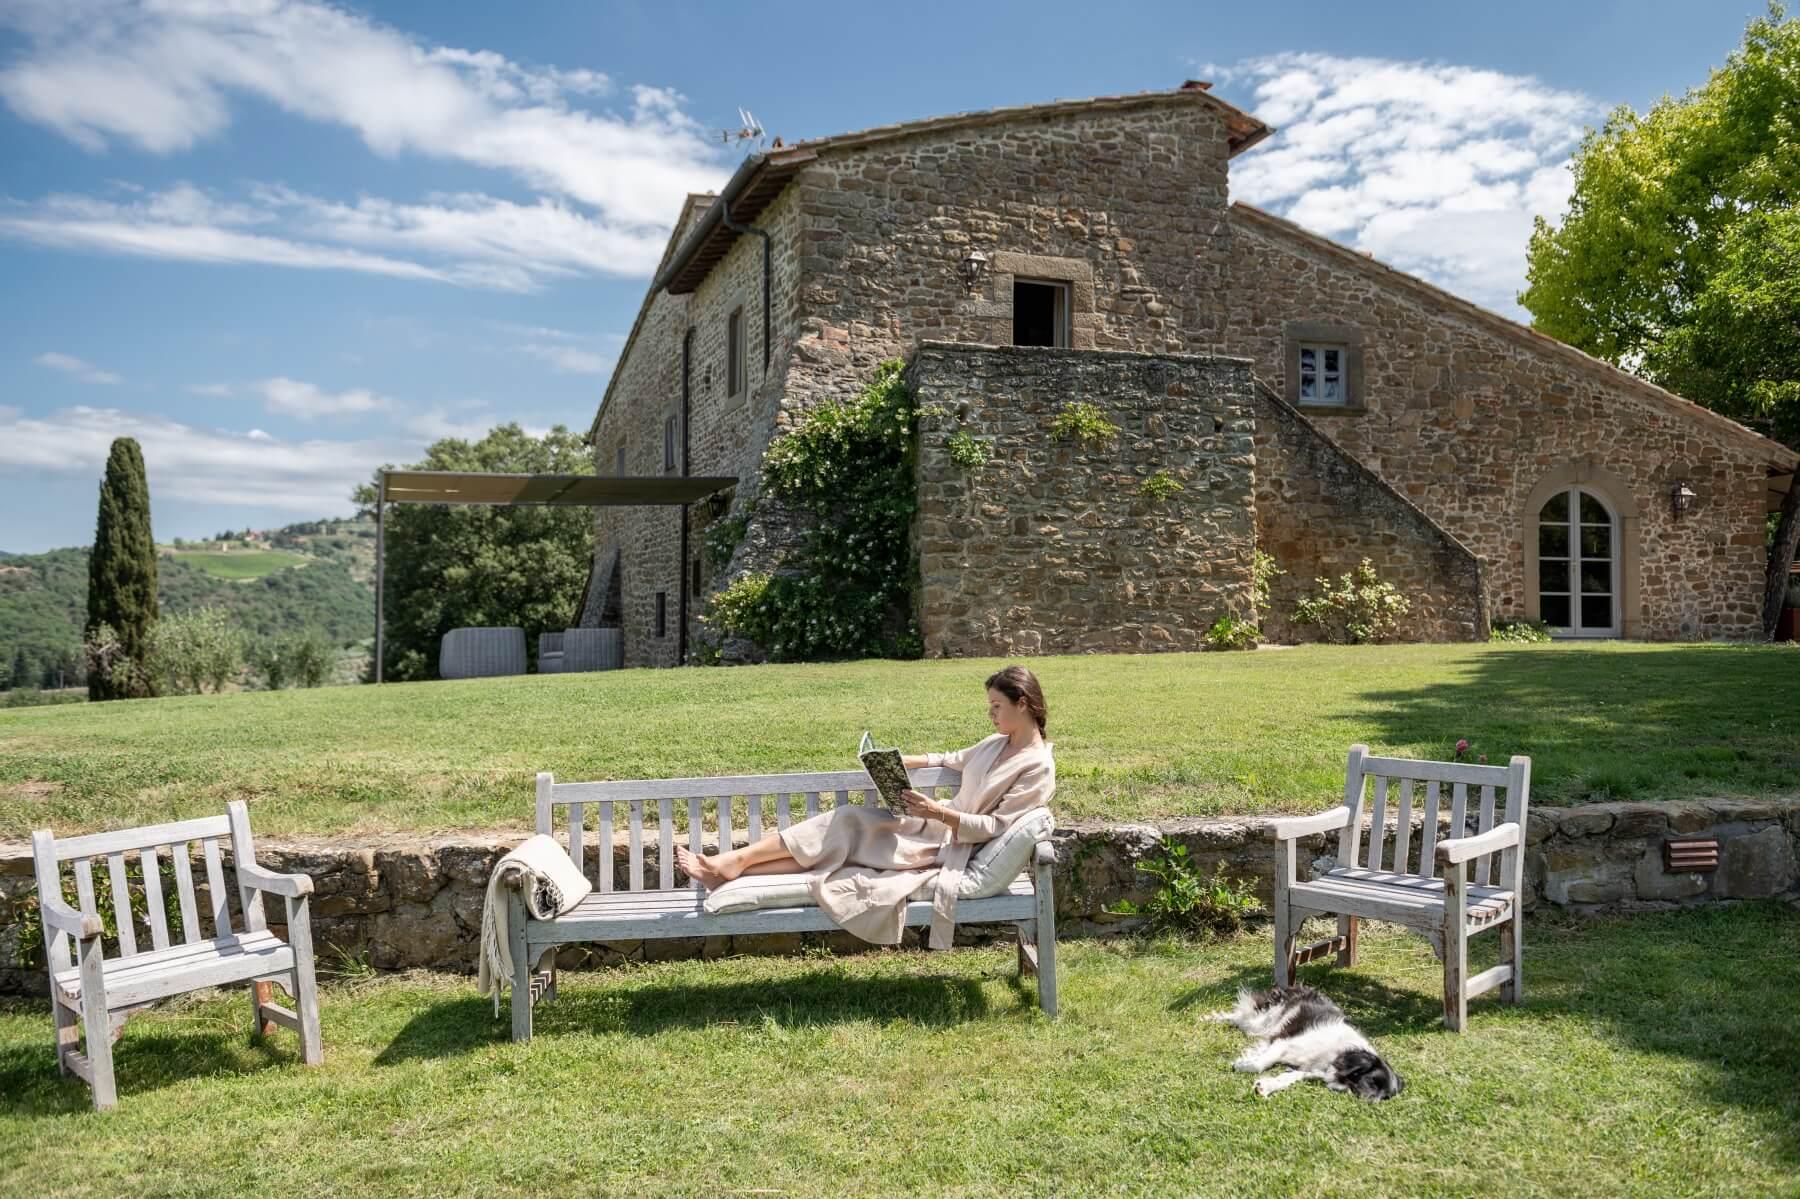 Villa Prenzano, Chianti, Tuscany - Paola Gheis Vacation Rental Consulting